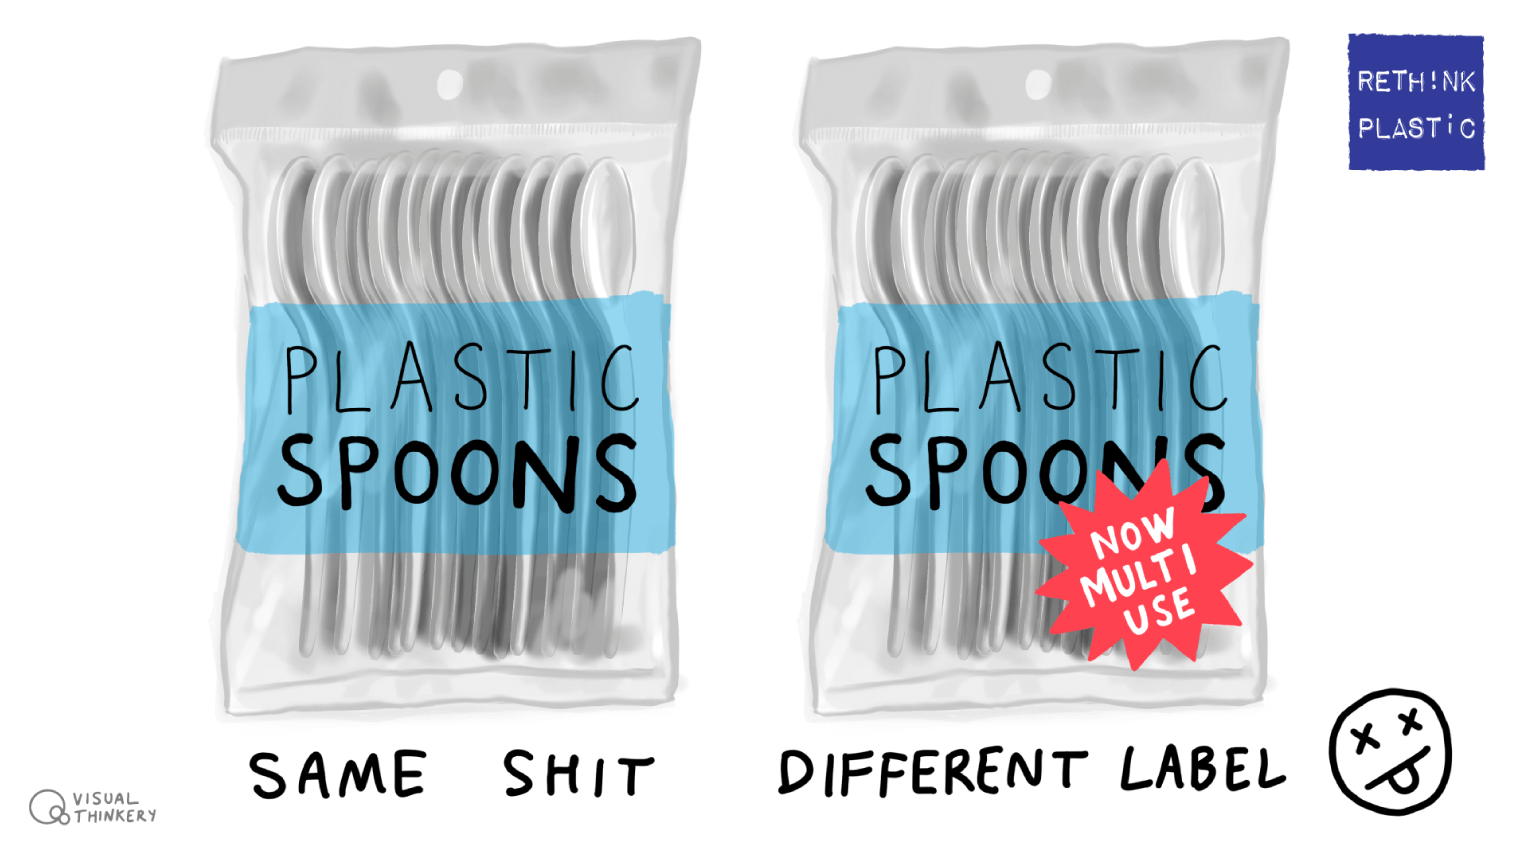 Rethink Plastic - Same shit